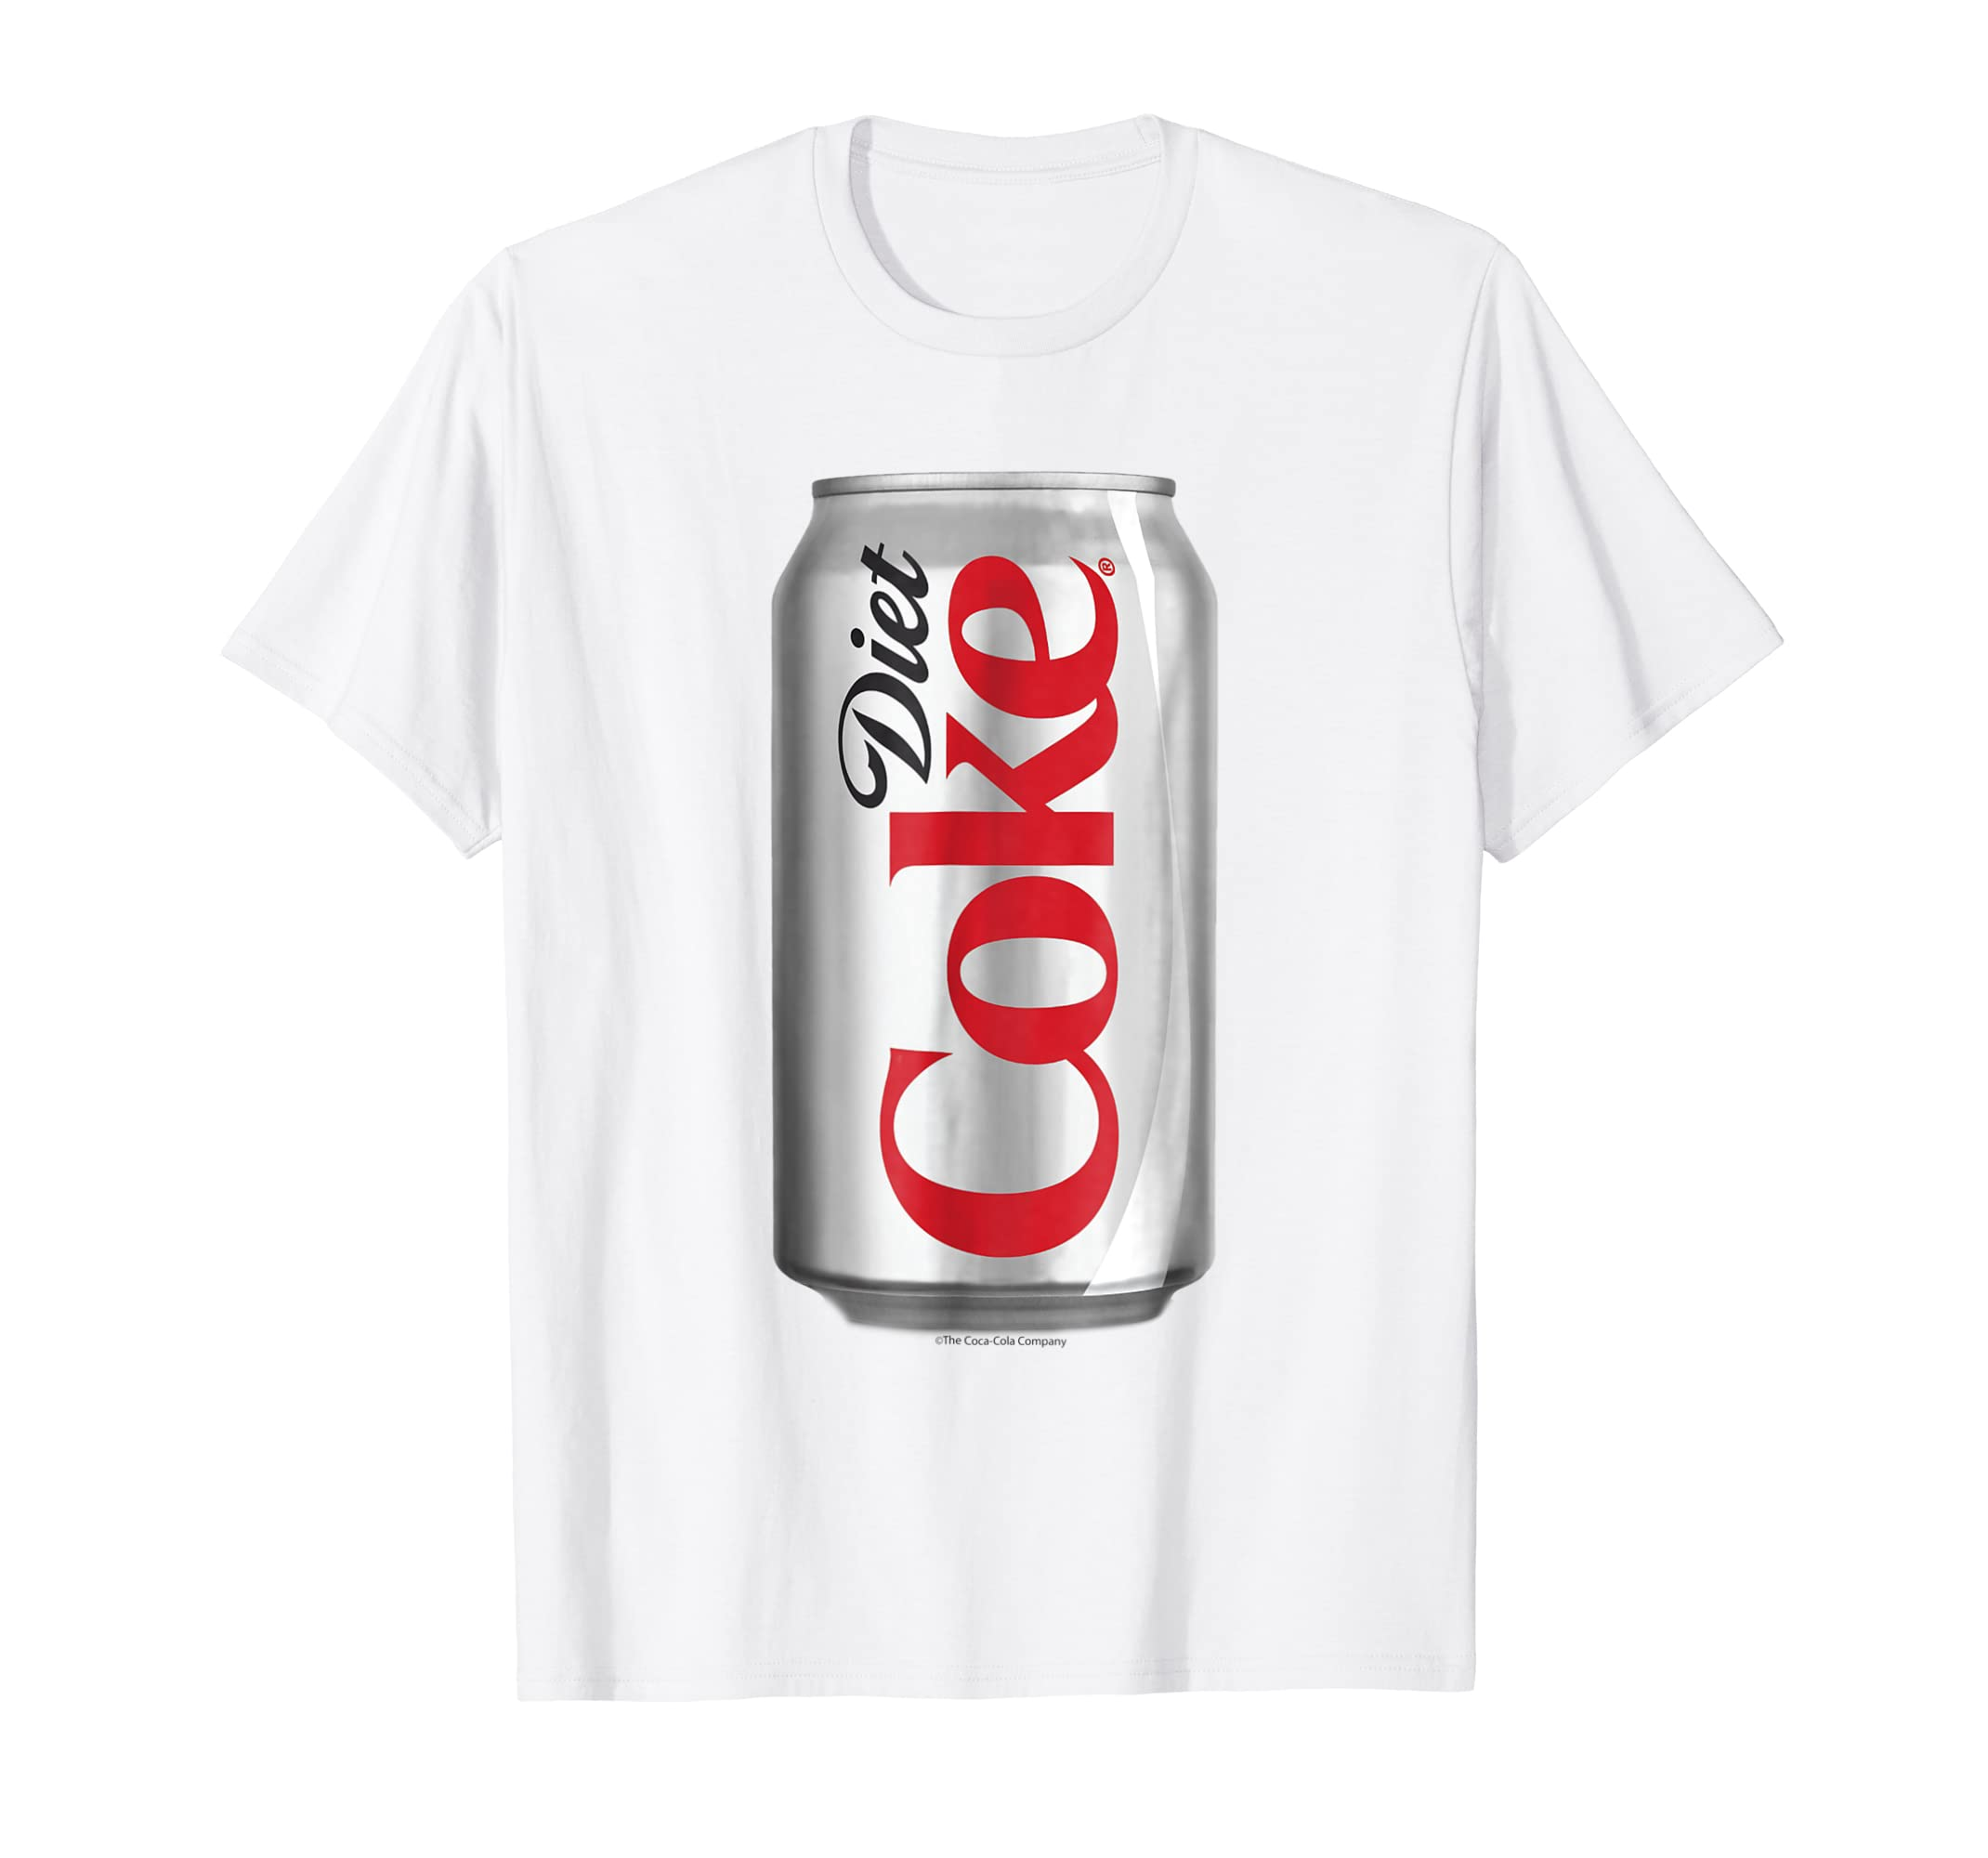 359eb533 Amazon.com: Coca-Cola Diet Coke Can Graphic T-Shirt: Clothing